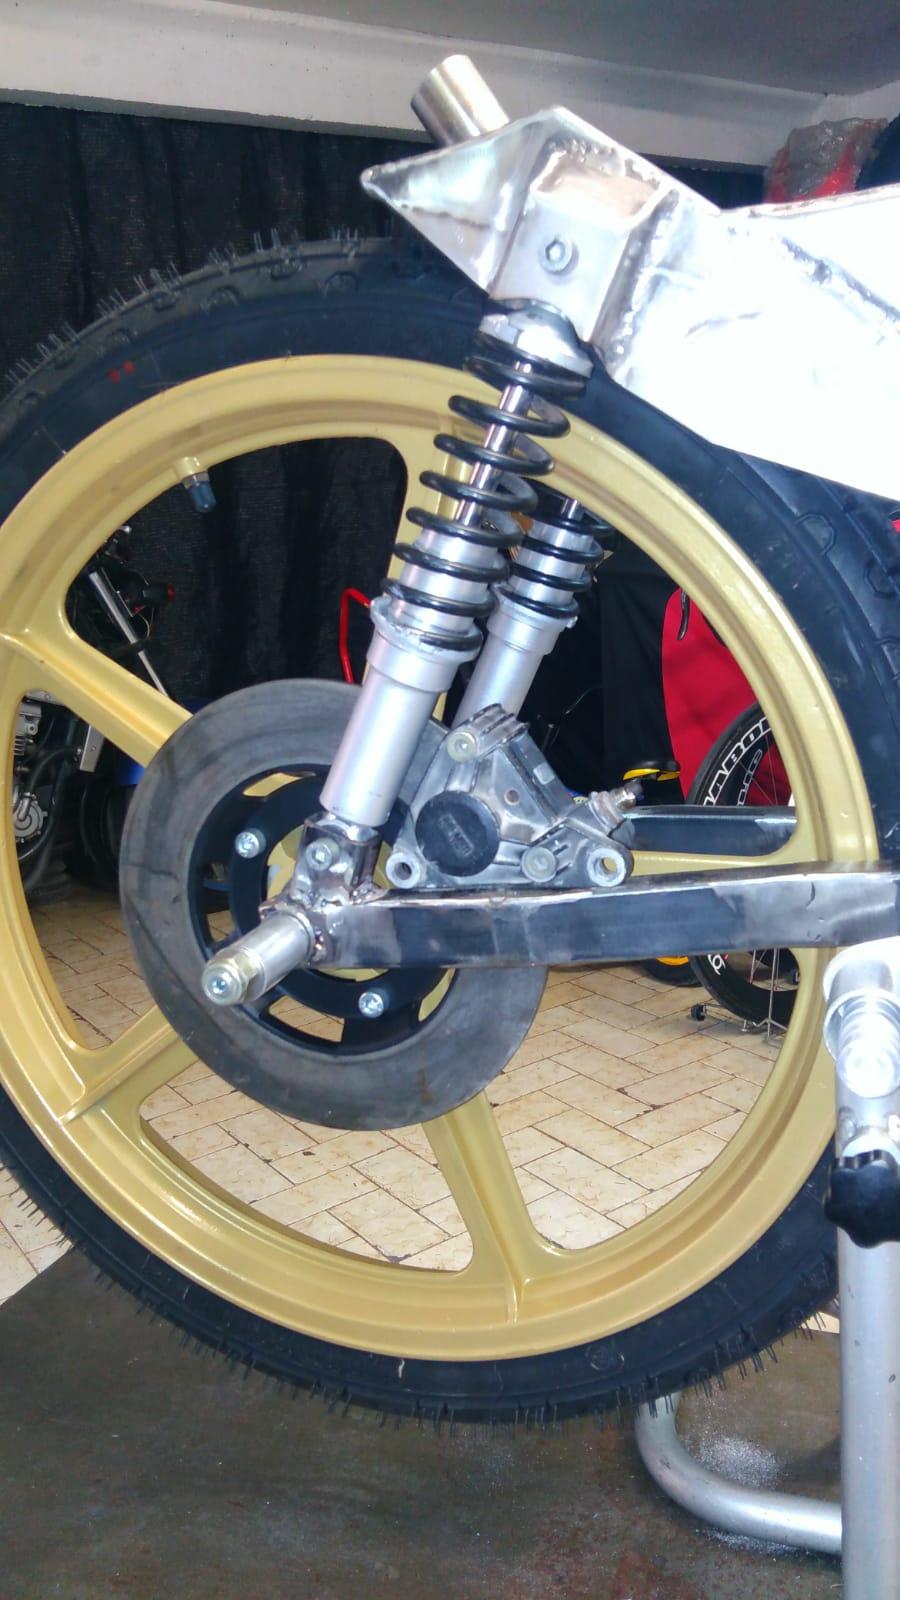 bultaco - Réplica Bultaco 50 MOTUL Carmona 1982 - Página 21 Kumz2310